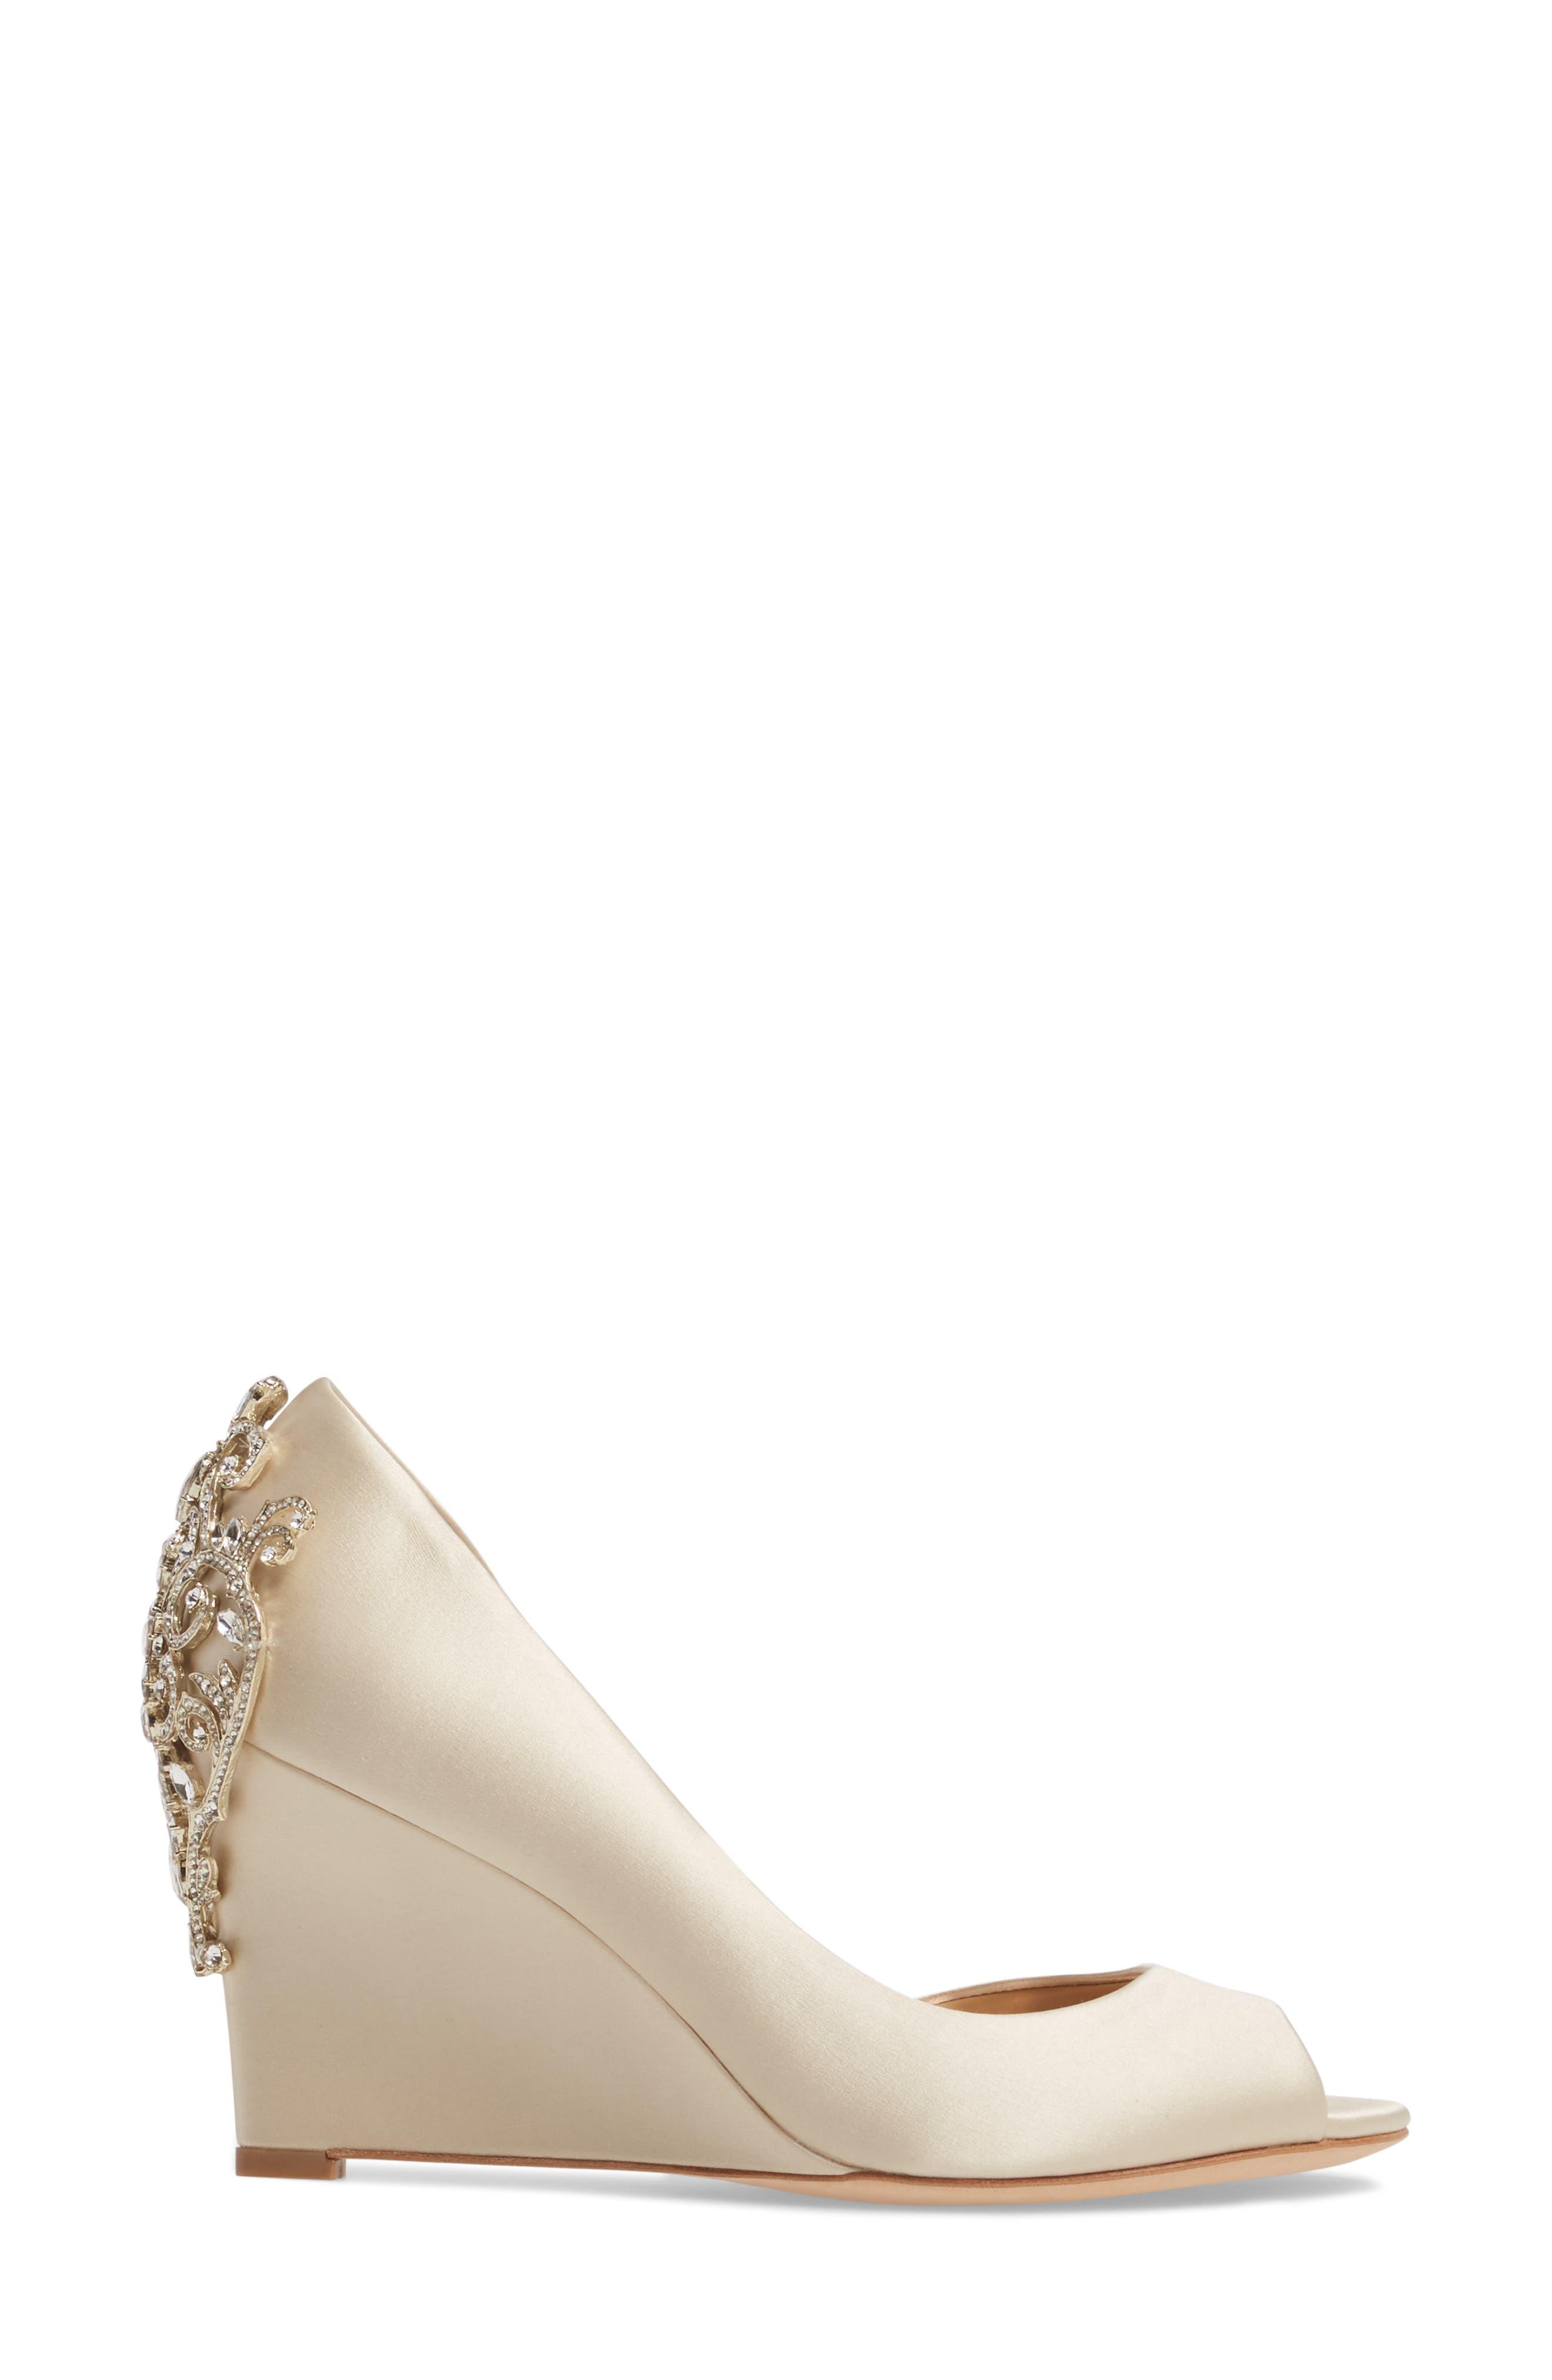 Meagan Embellished Peep Toe Wedge,                             Alternate thumbnail 3, color,                             Ivory Satin